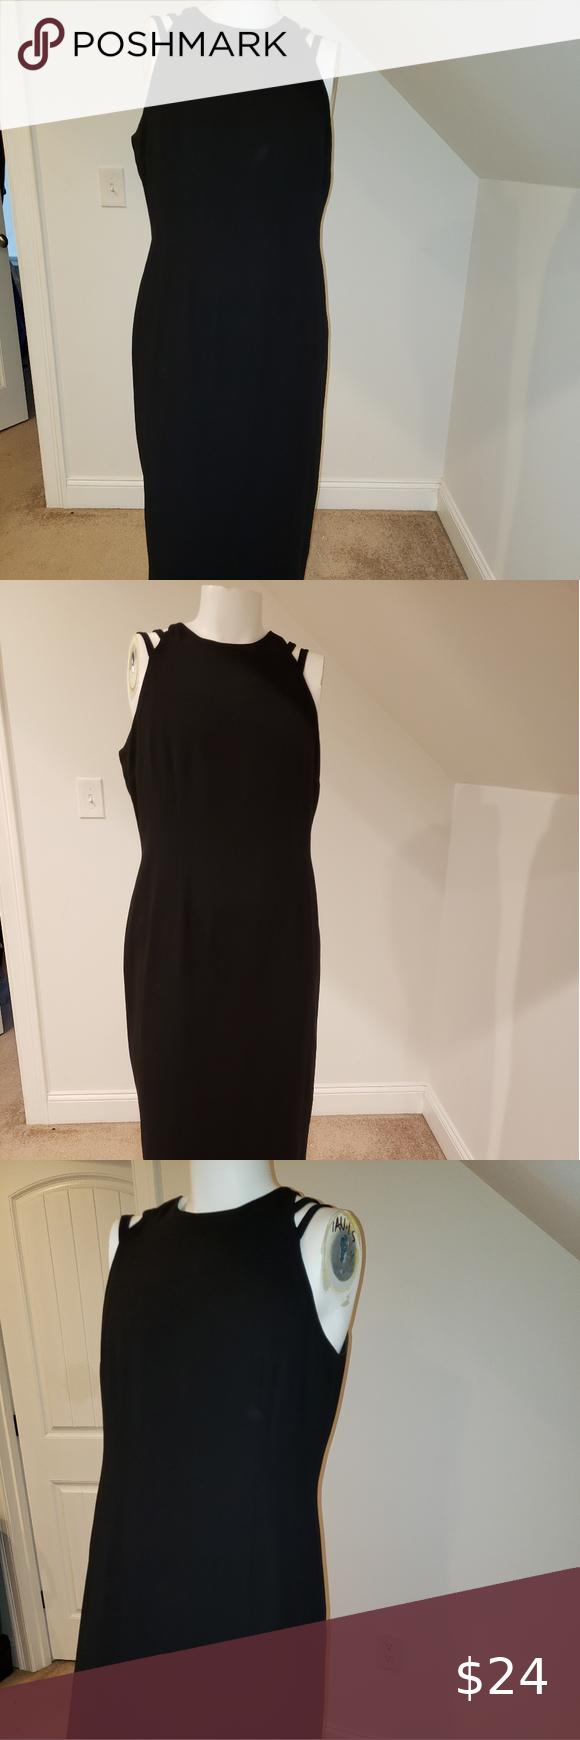 Evan Picone Black Long Dress Size 16 Long Black Dress Size 16 Dresses Dresses [ 1740 x 580 Pixel ]